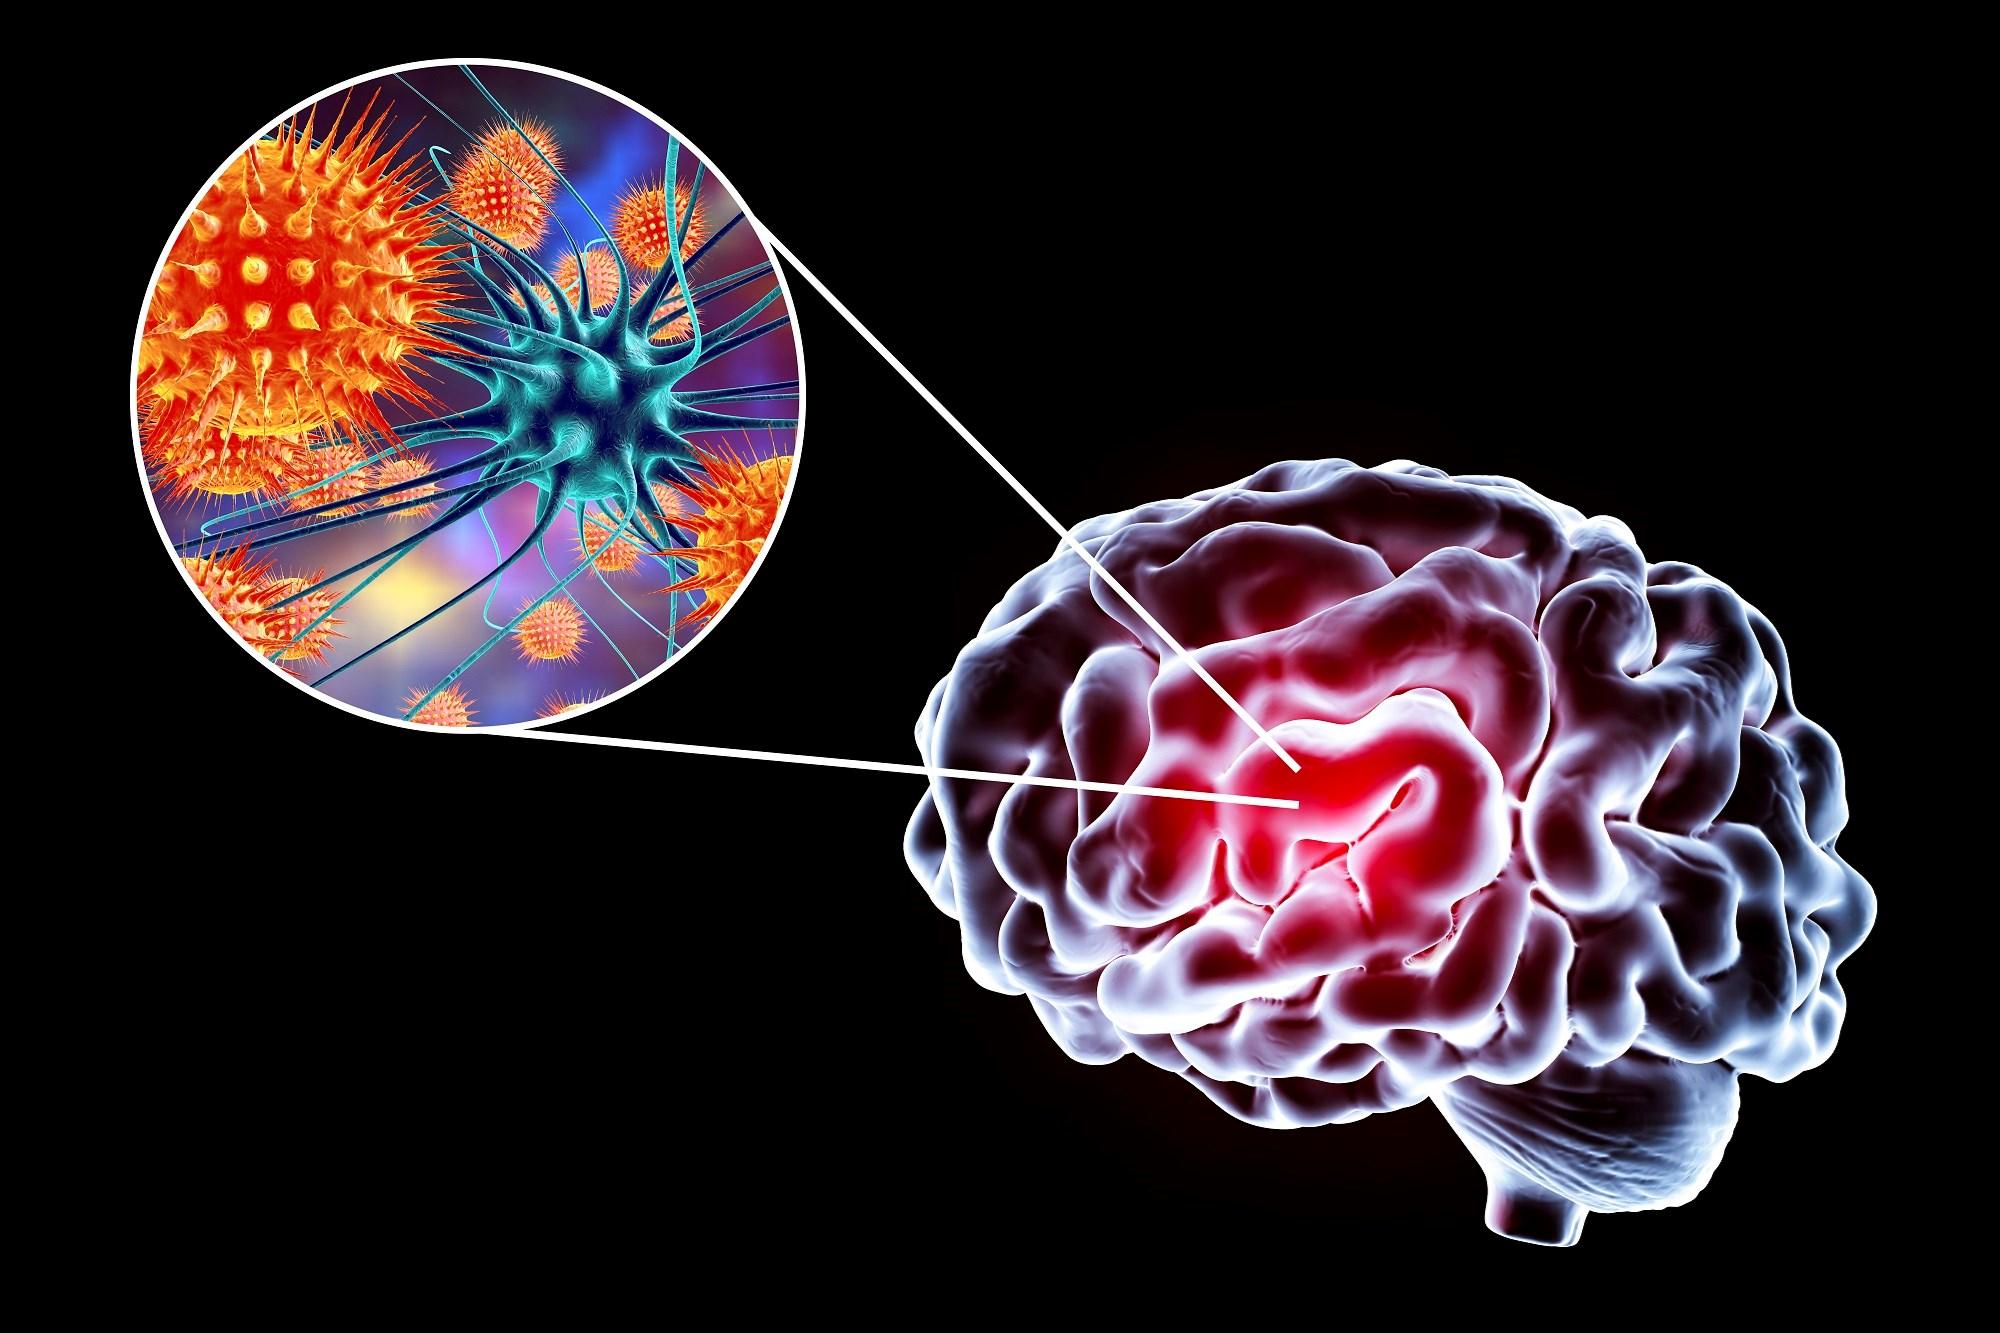 HCV Neuropsychiatric Symptoms Likely Linked to Virus' Effects on Brain Function